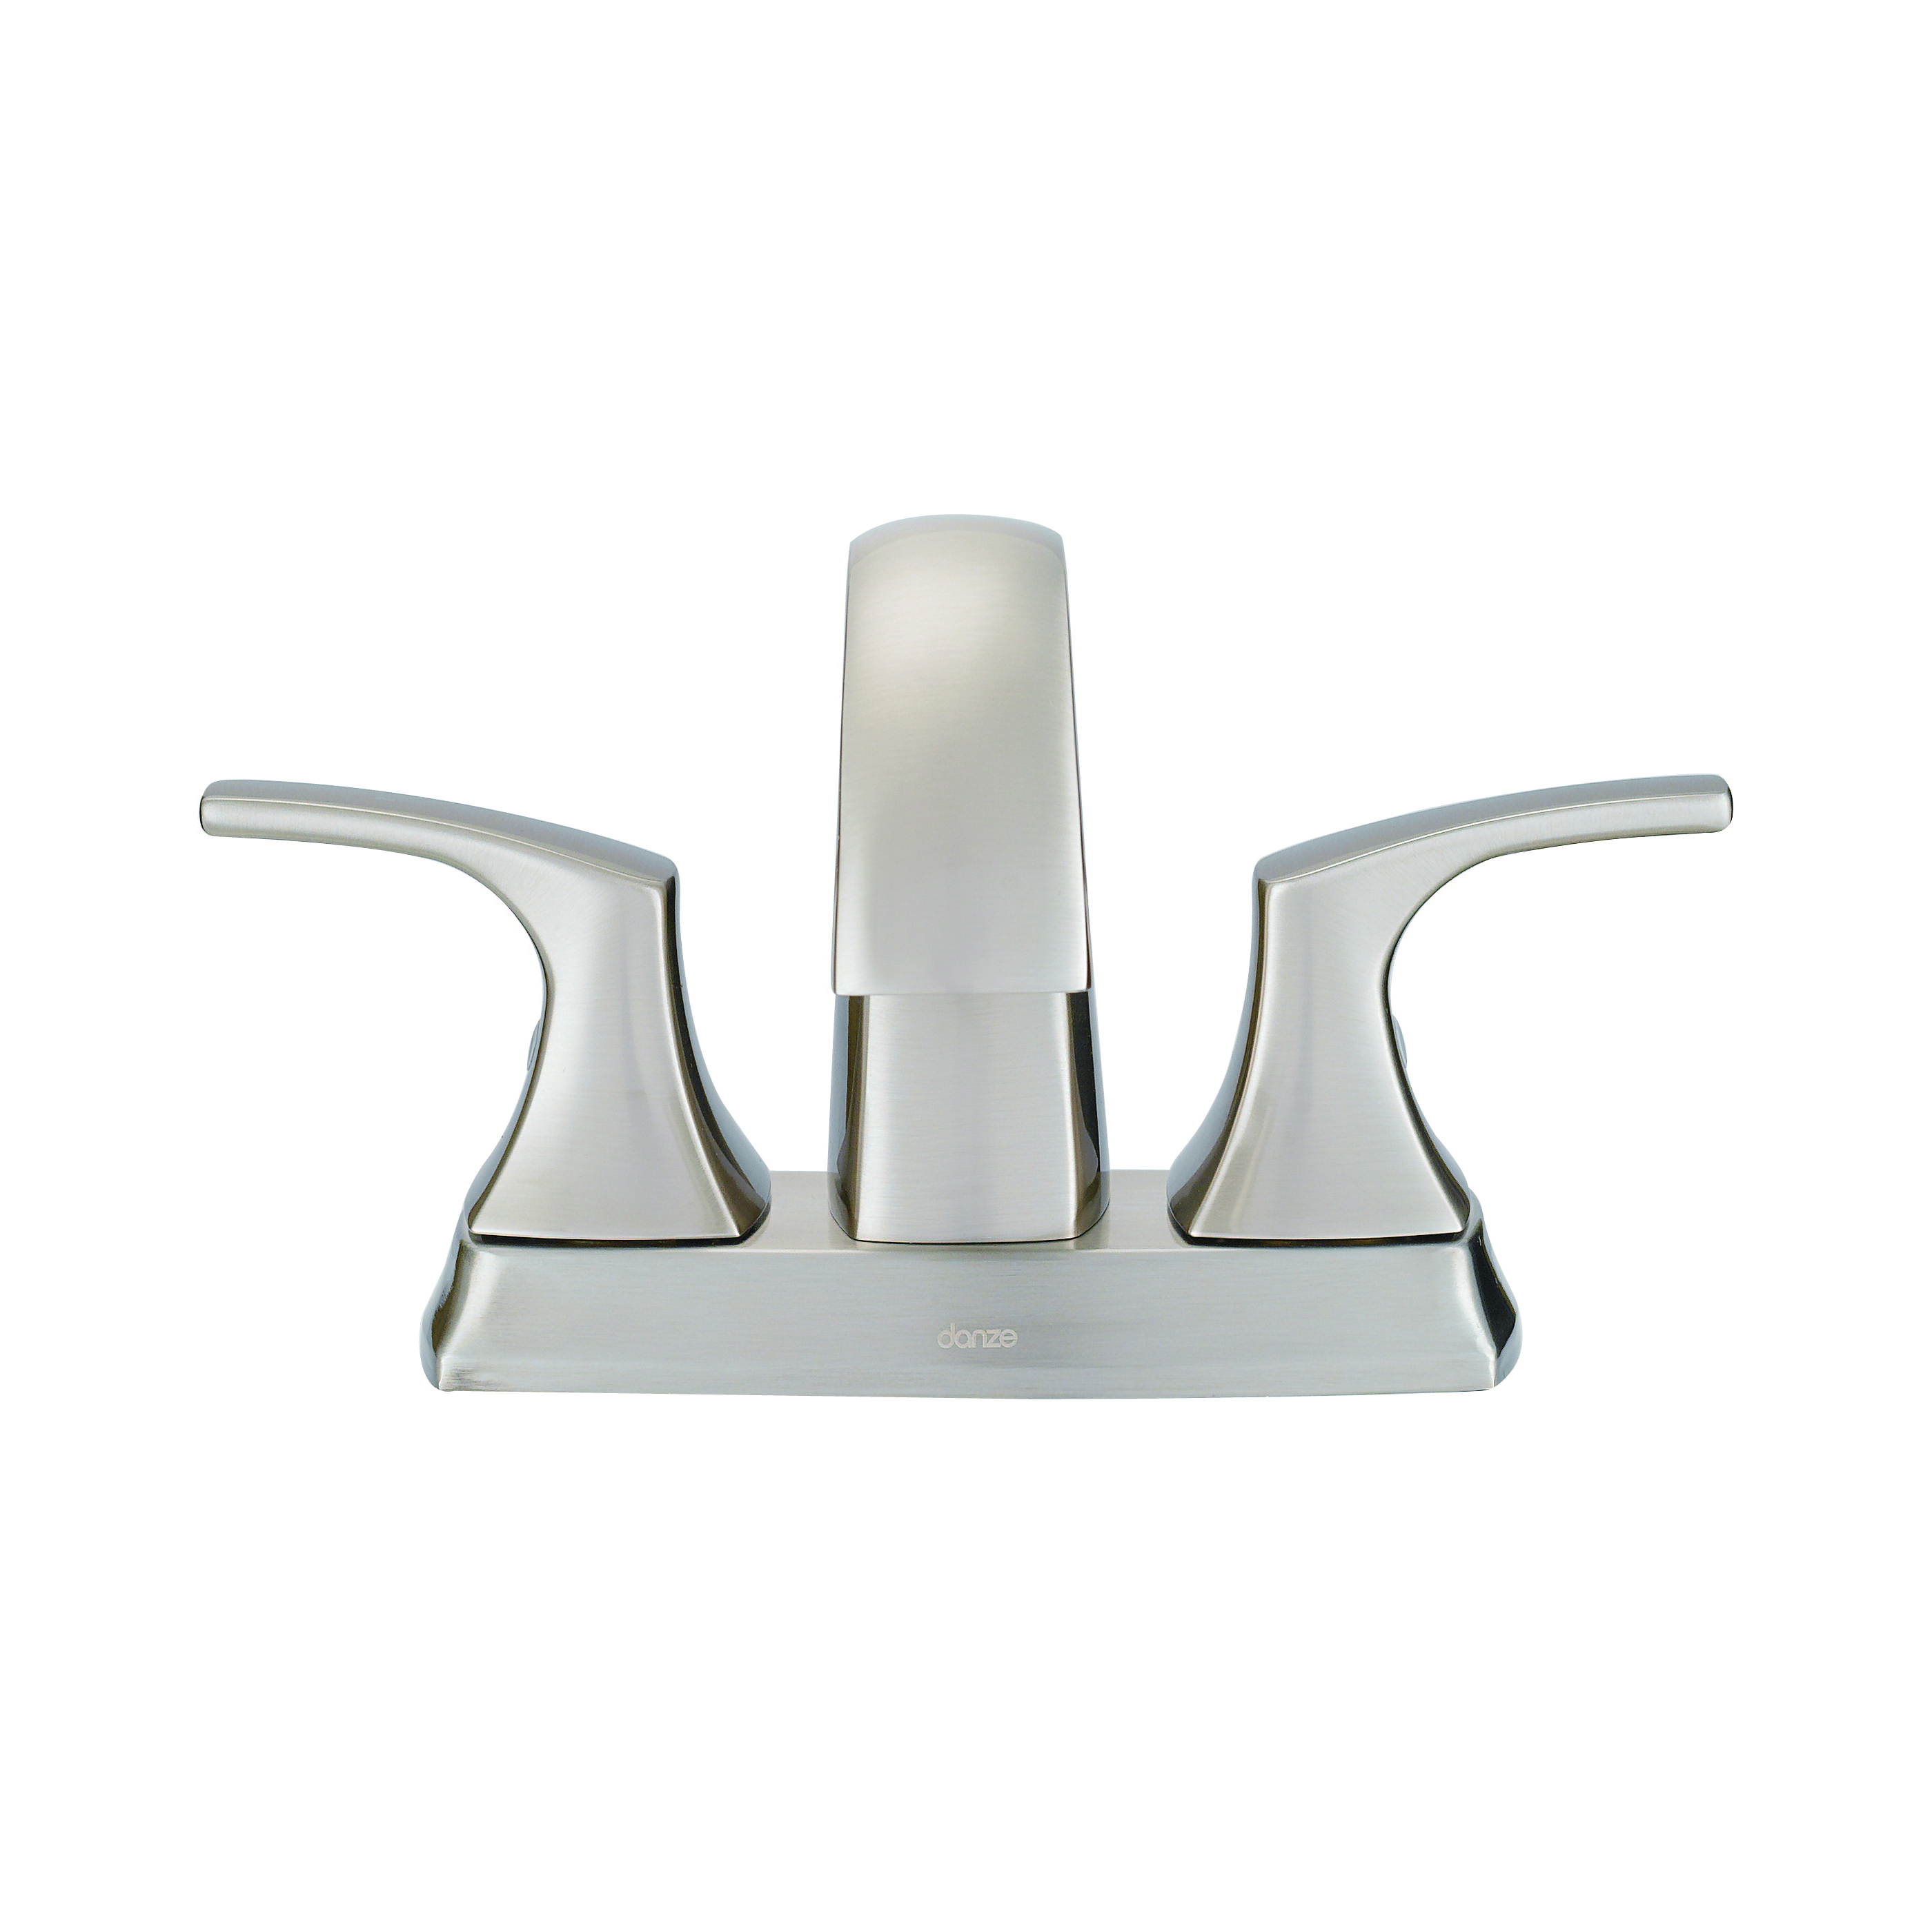 Danze® D307018BN Centerset Lavatory Faucet, Vaughn™, Brushed Nickel, 2 Handles, Metal Pop-Up Drain, 1.2 gpm